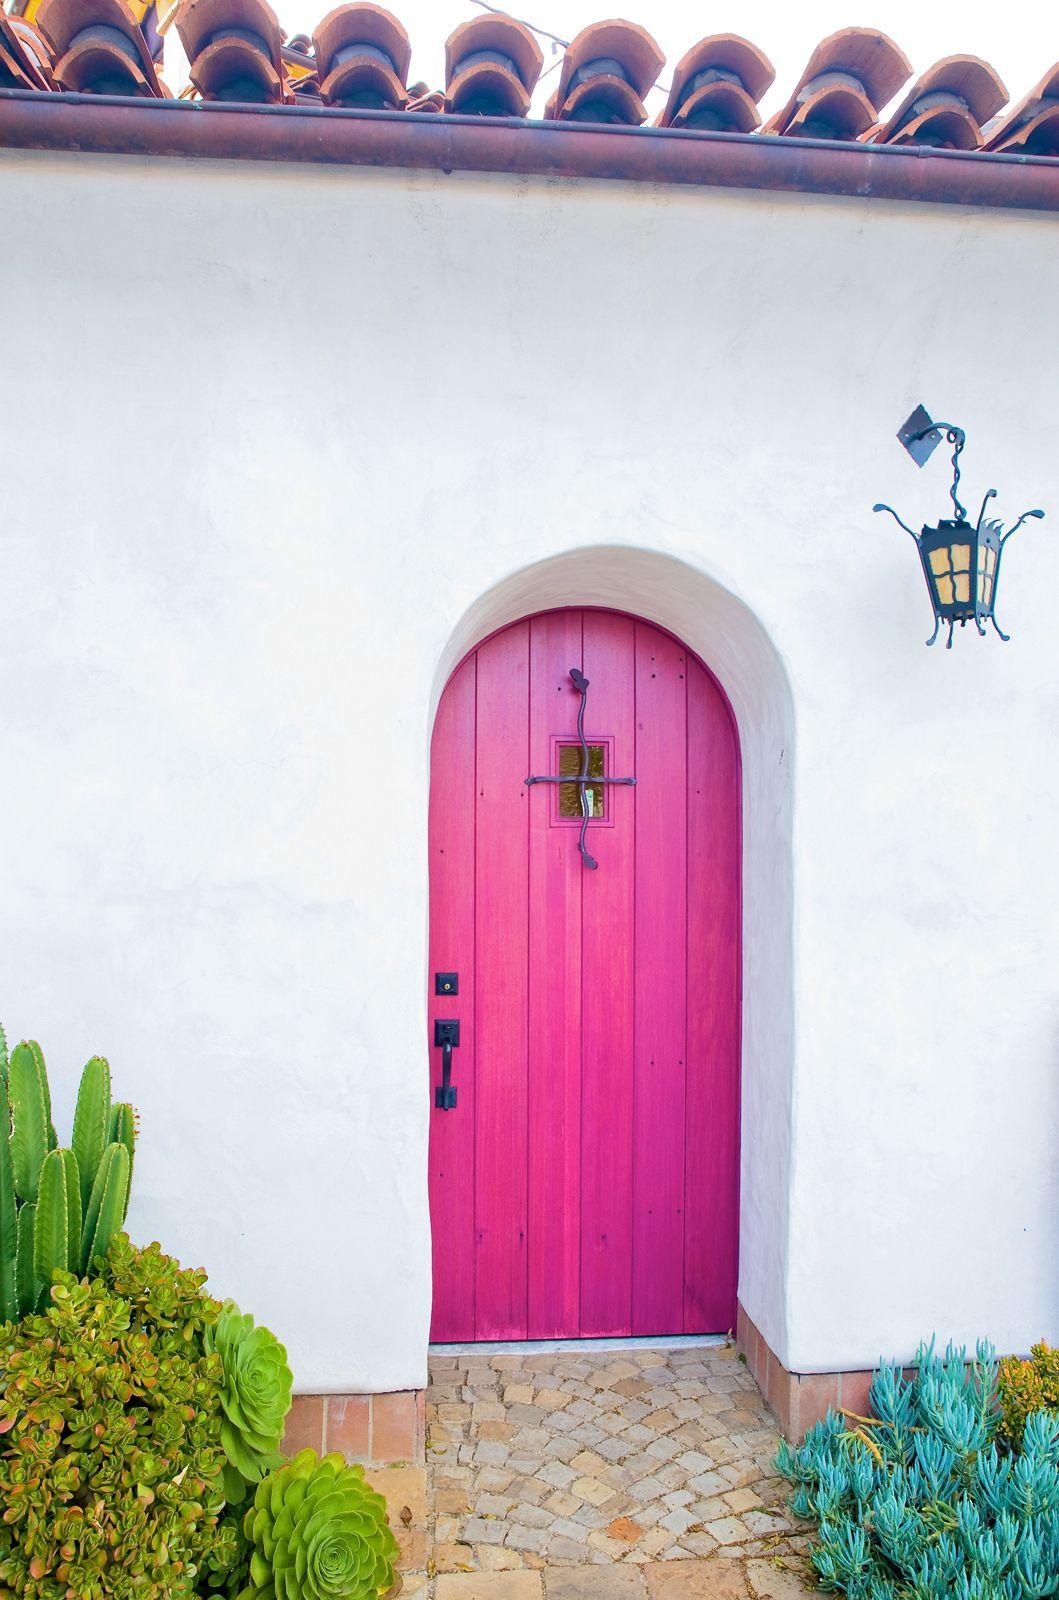 Photo 3 of 6 in contemporary hints in santa barbara iron gray purple iron railings a fuchsia and green wooden entry and garage doors rubansaba